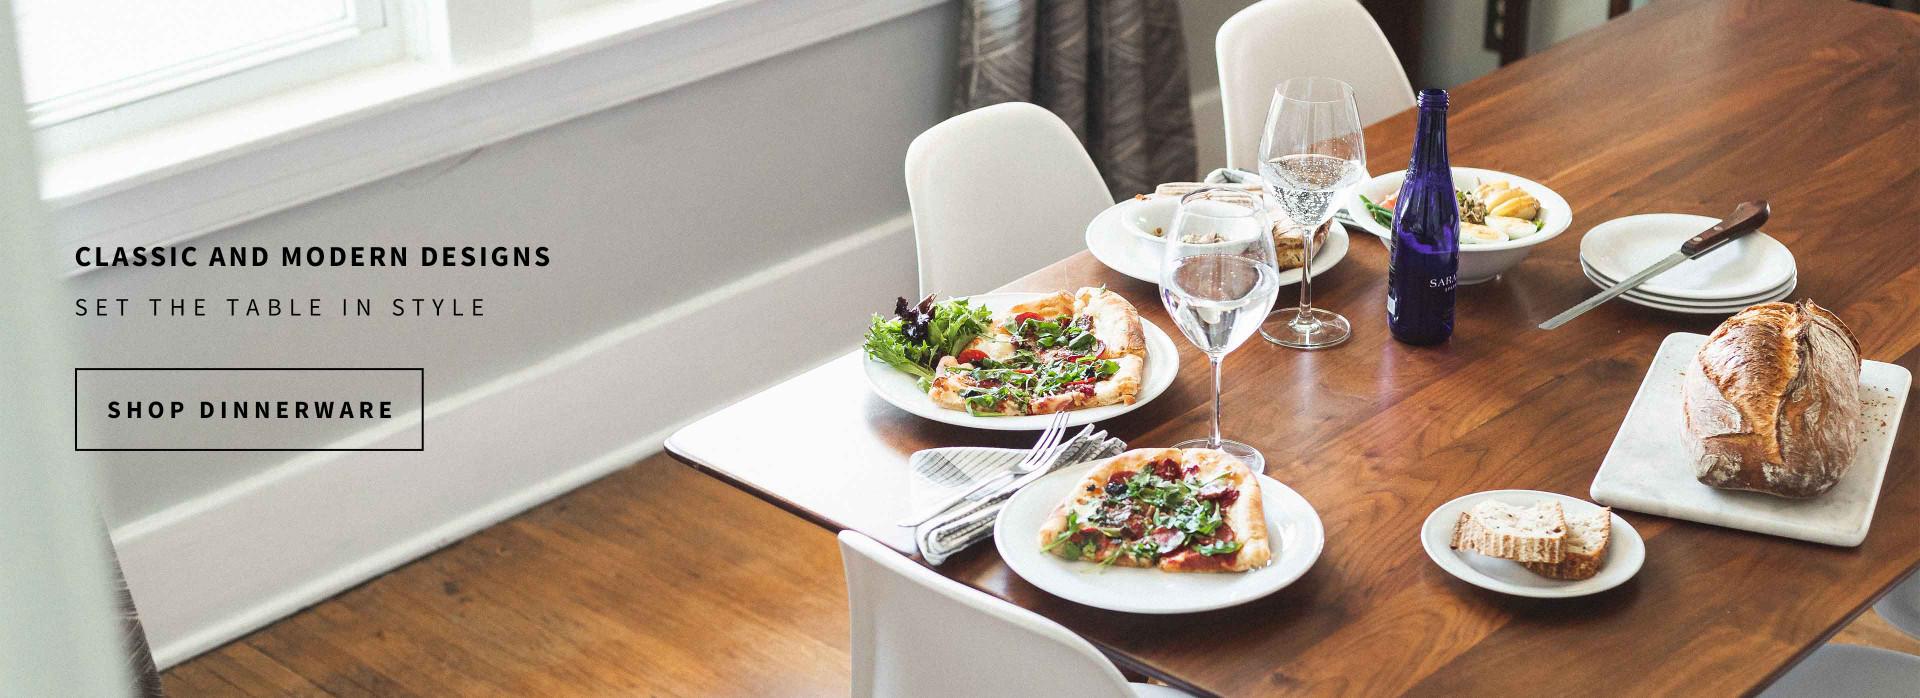 classic and modern designs, shop dinnerware